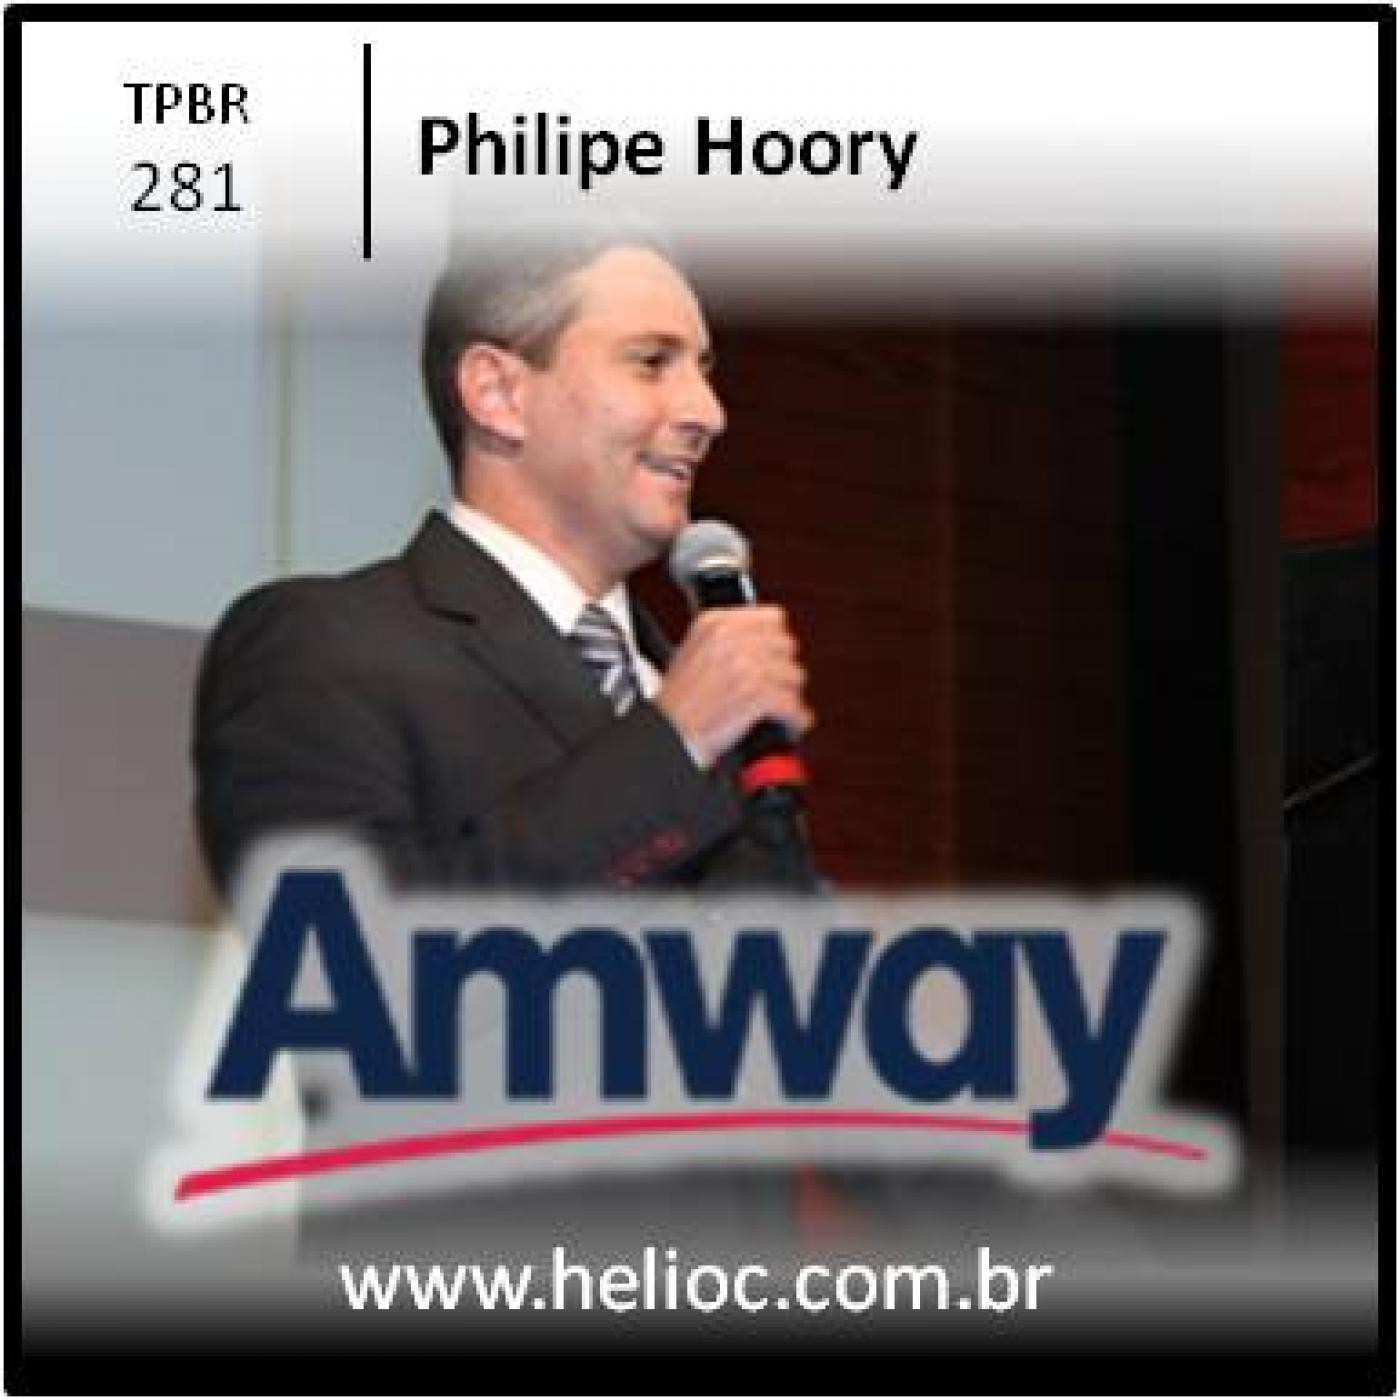 TPBR 281 - Encruzilhadas da Vida - Philipe Hoory